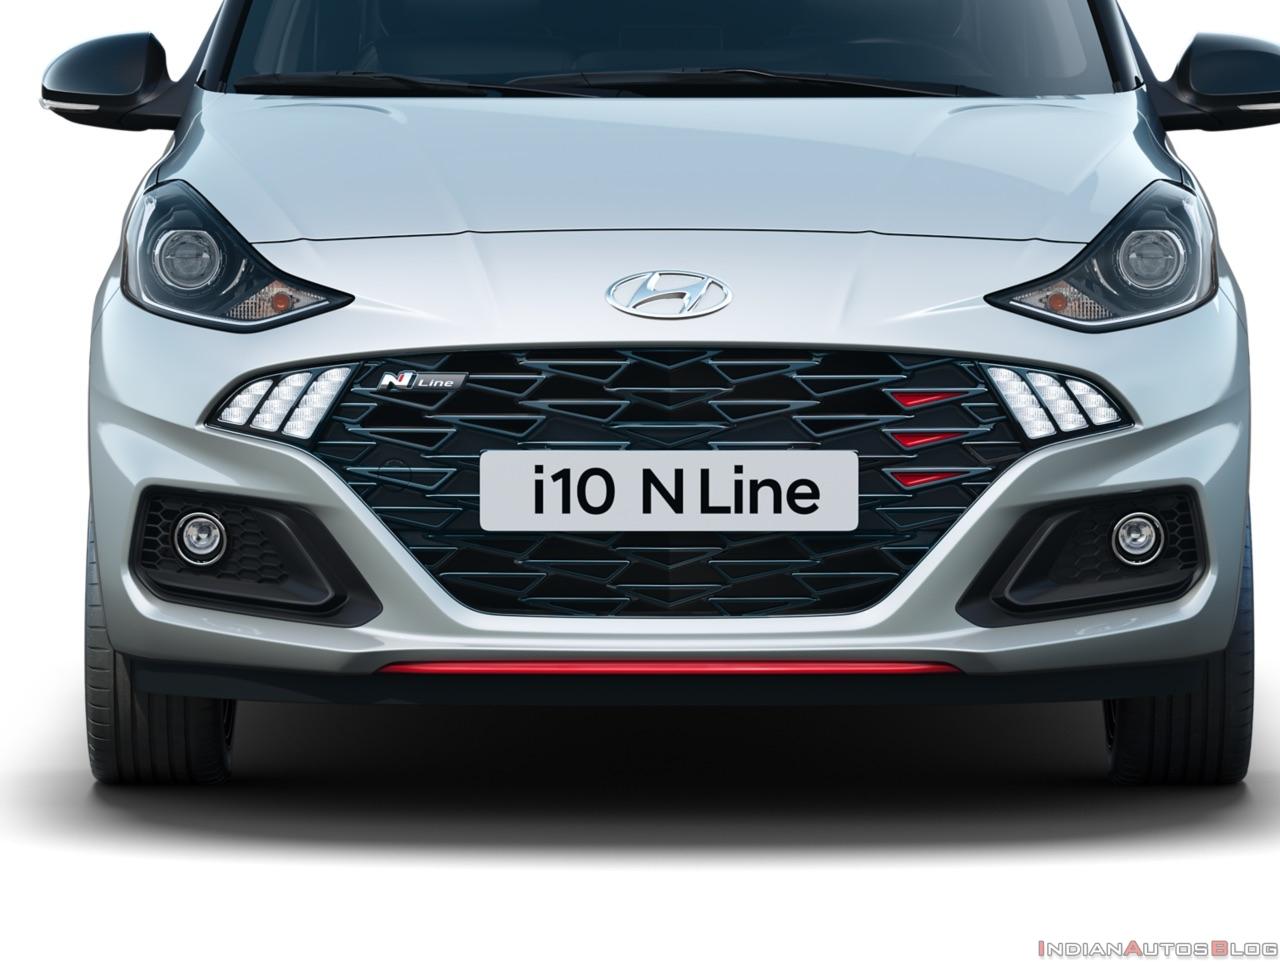 hyundai-i10-n-line-front-fascia-5d8c.jpg